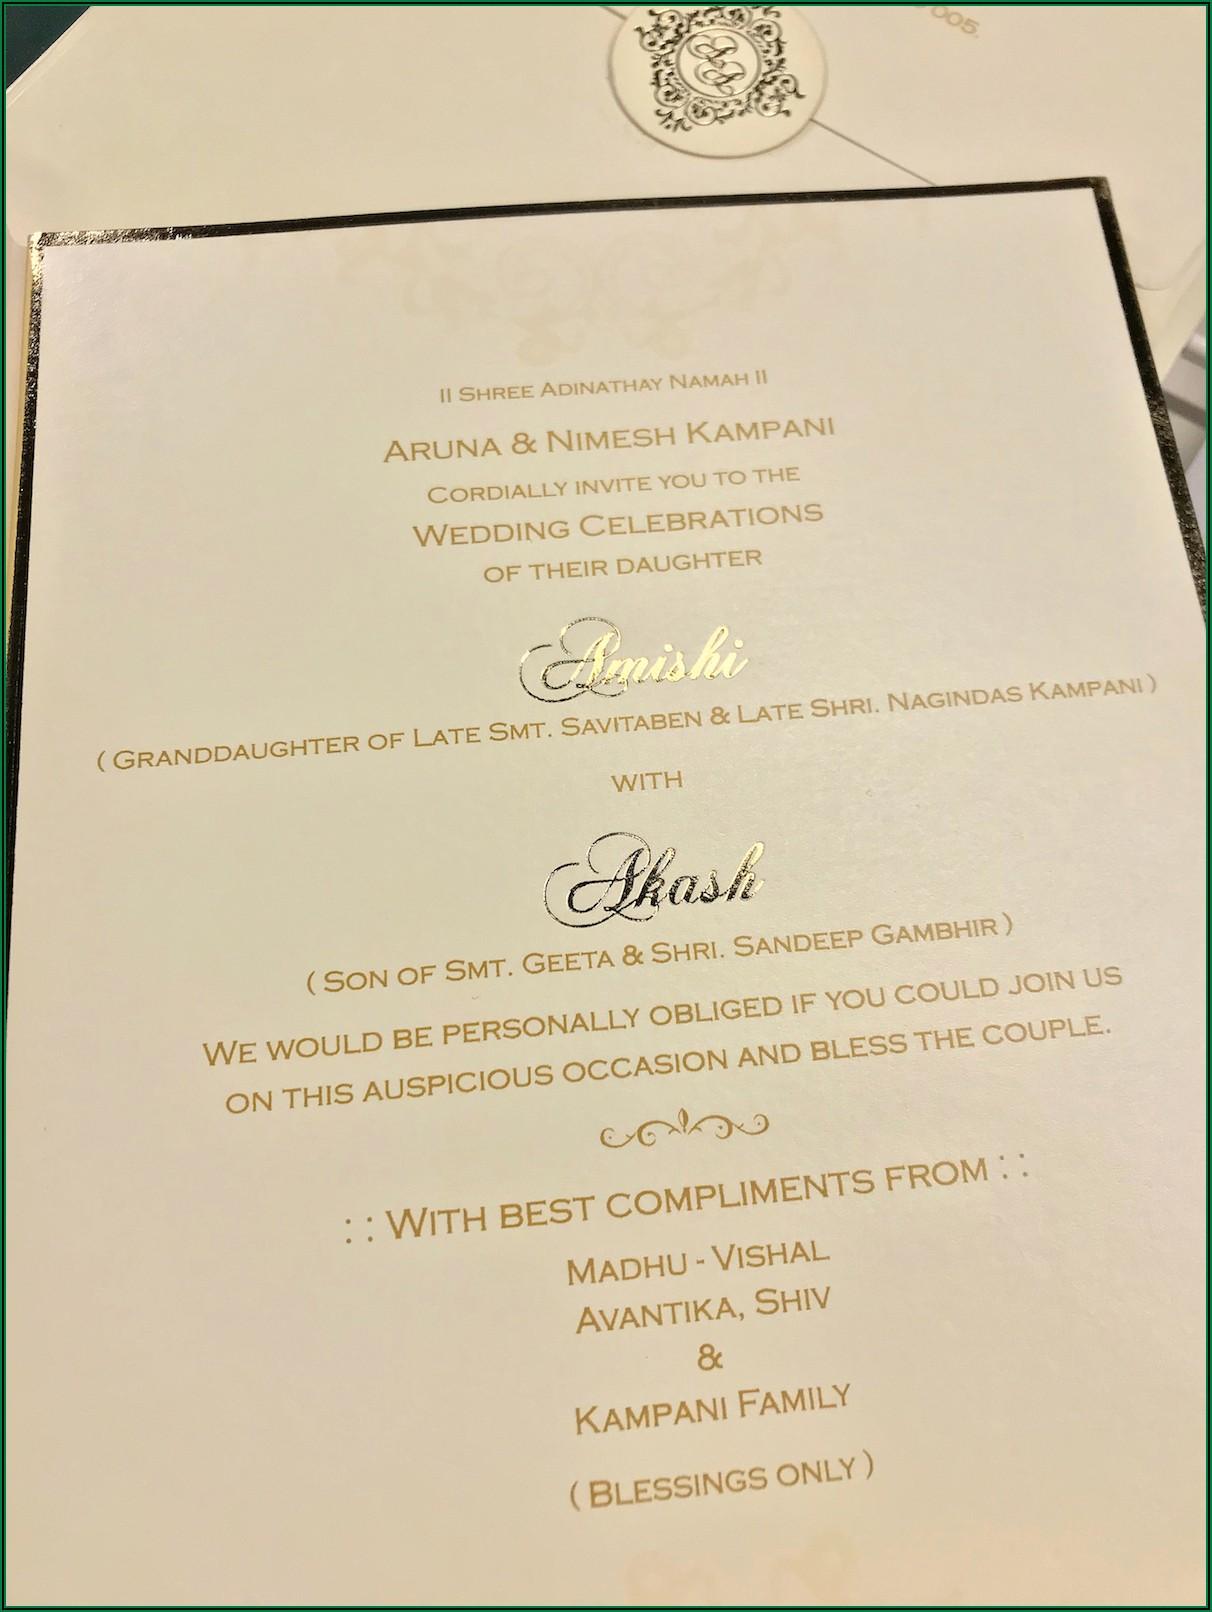 Hindu Wedding Invitation Message In English